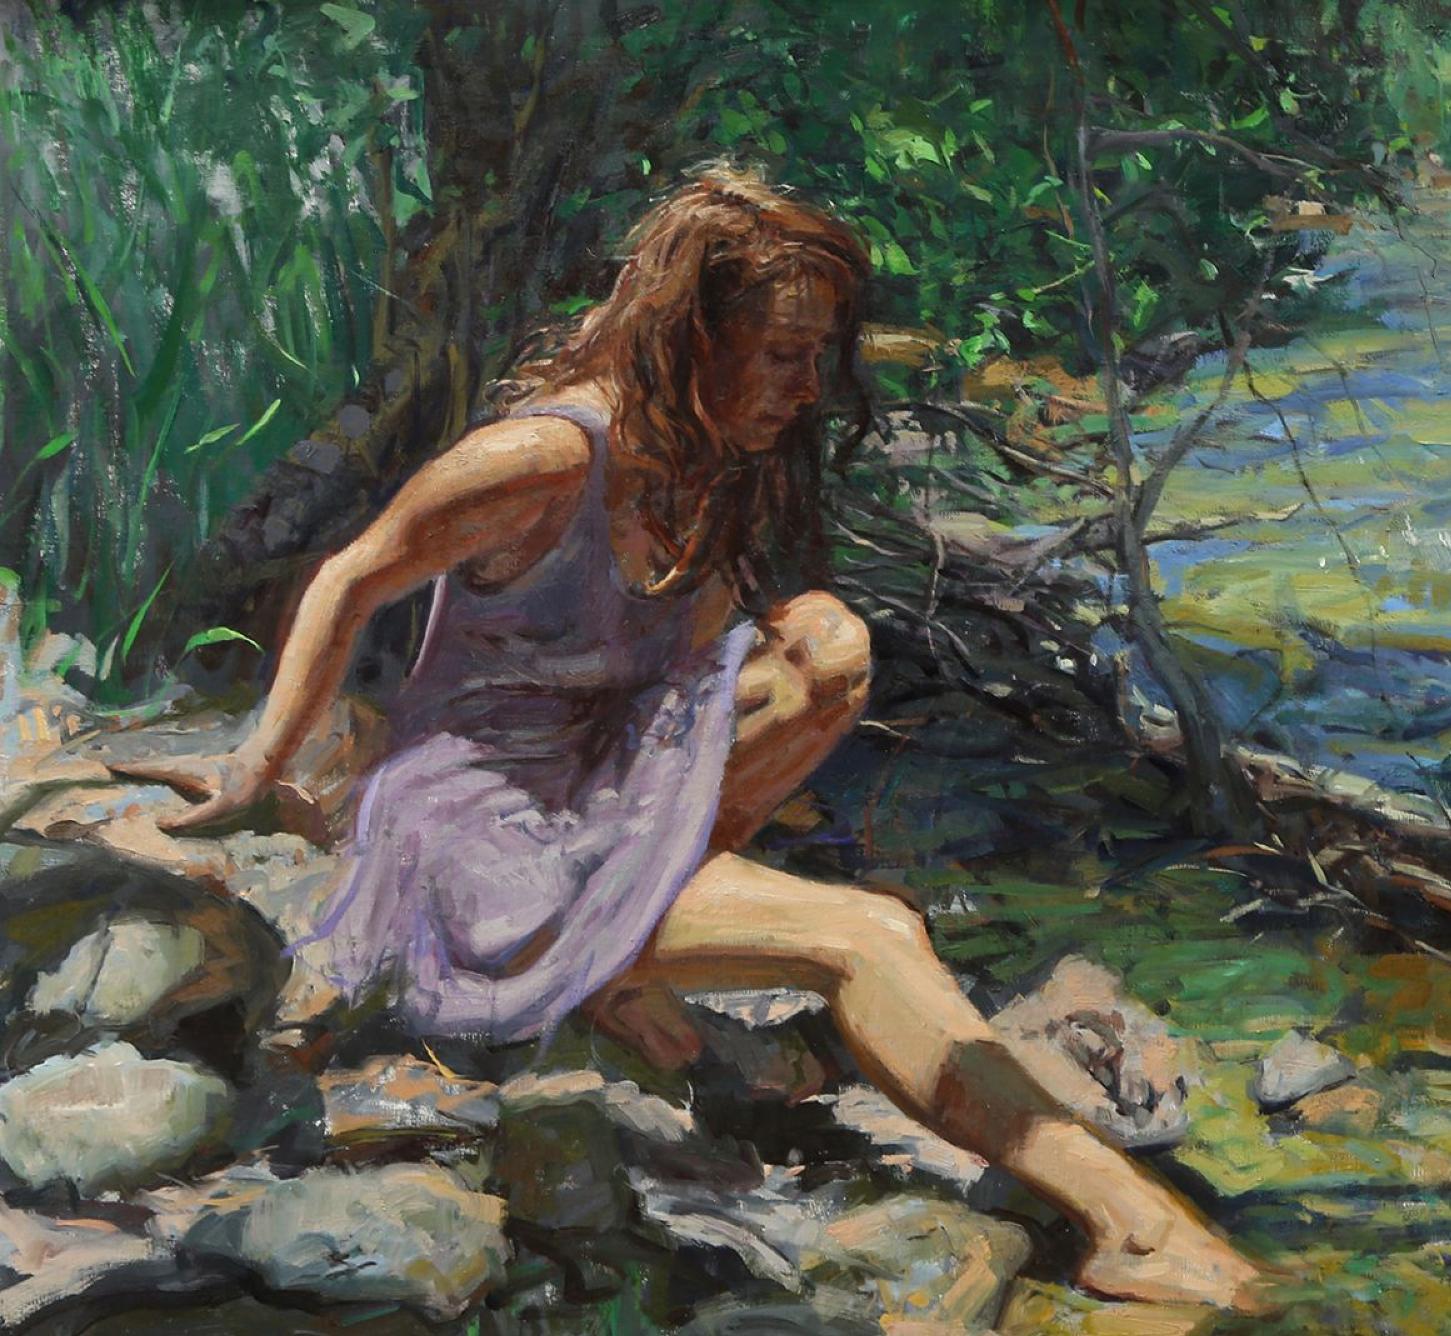 Childhood Brook, oil ,American Impressionistic, Colorado, New Orientalist, India